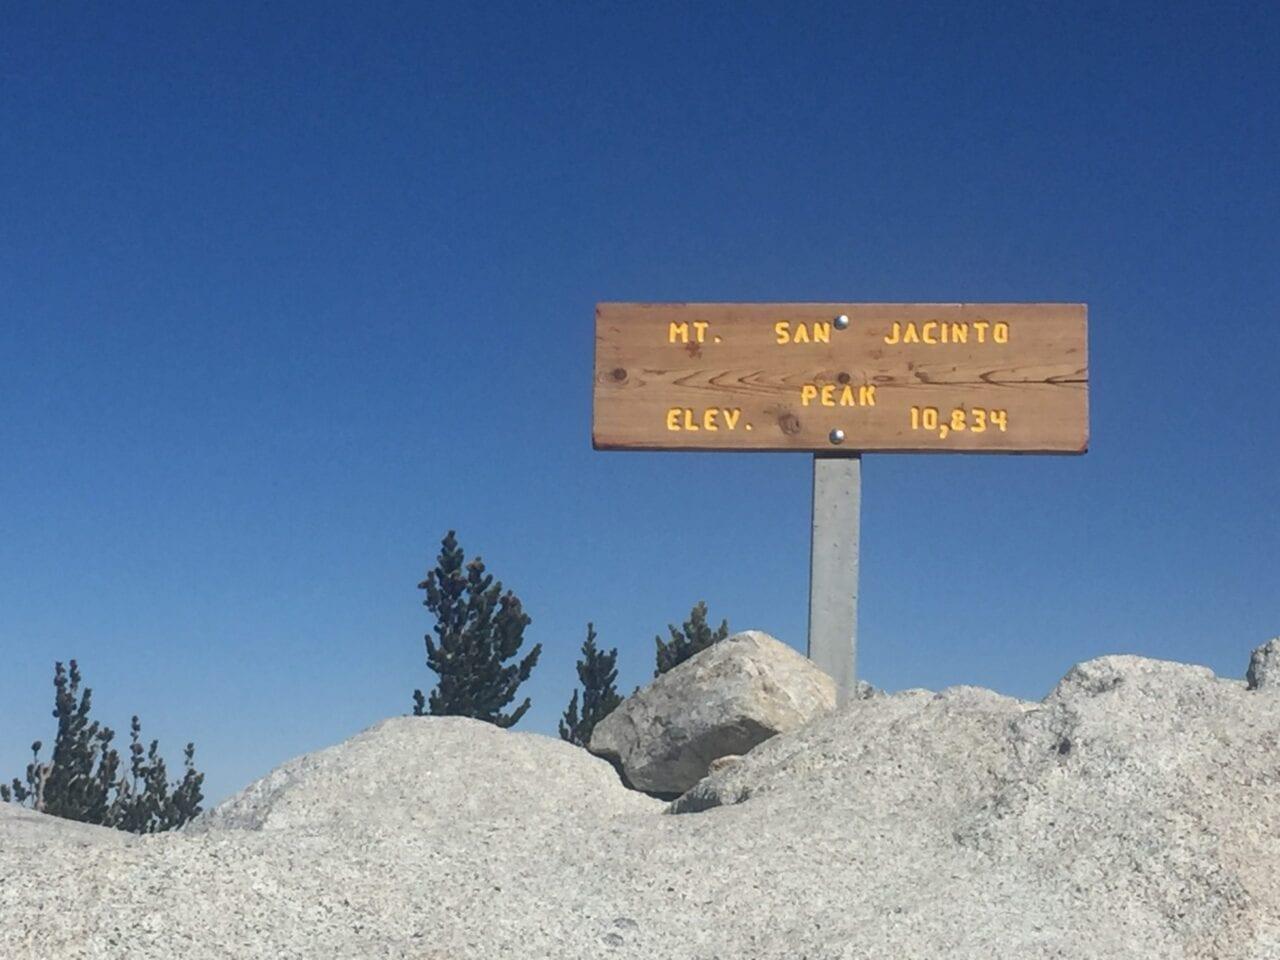 Mt. San Jacinto sign